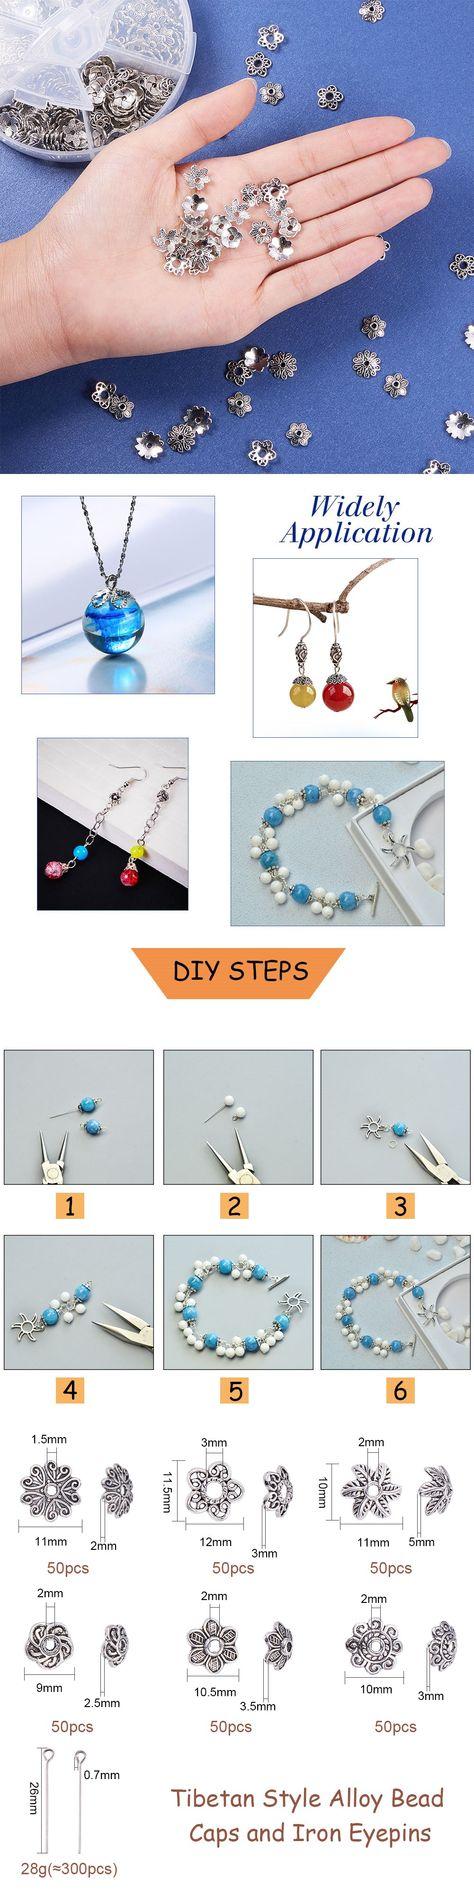 300pcs Tibetan Silver Charm 5mm Flower Crafts Bead Caps Bracelets Jewelry Making